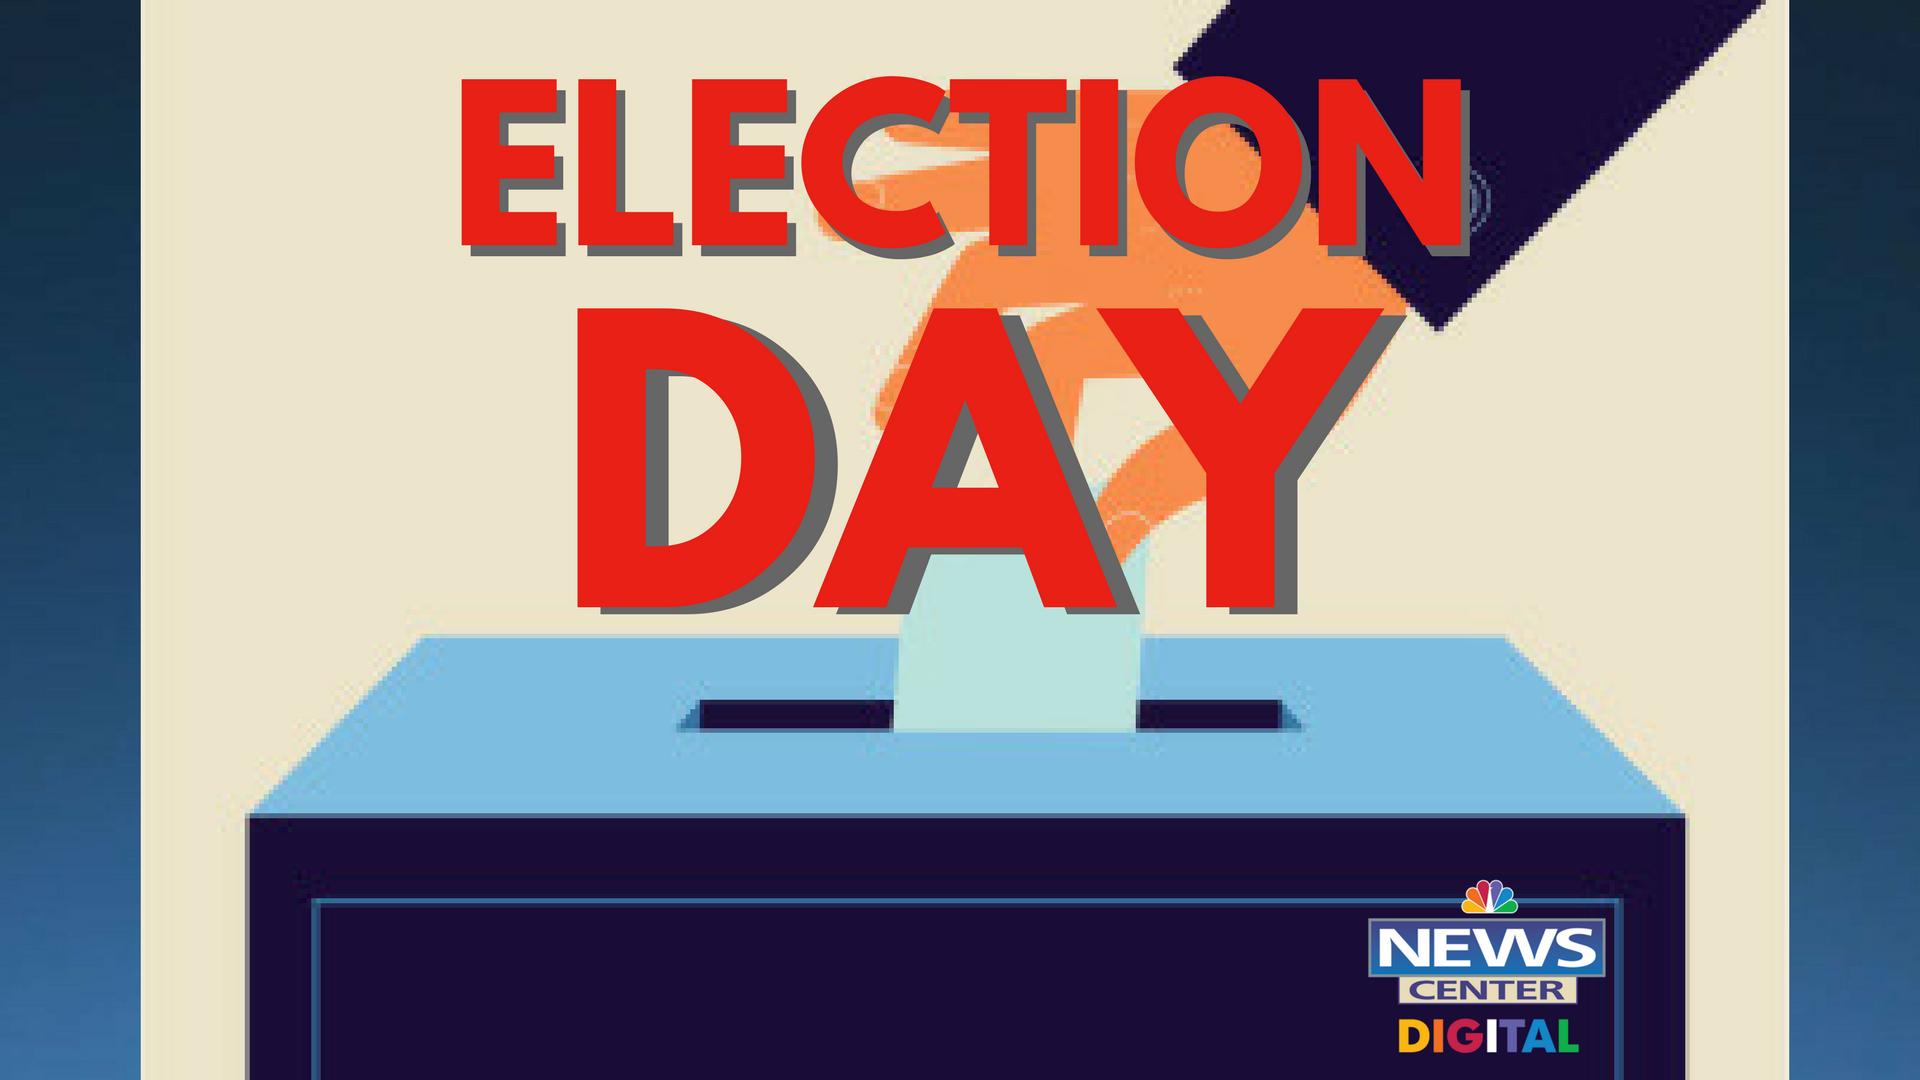 Election Day 2017 | WLBZ2.com